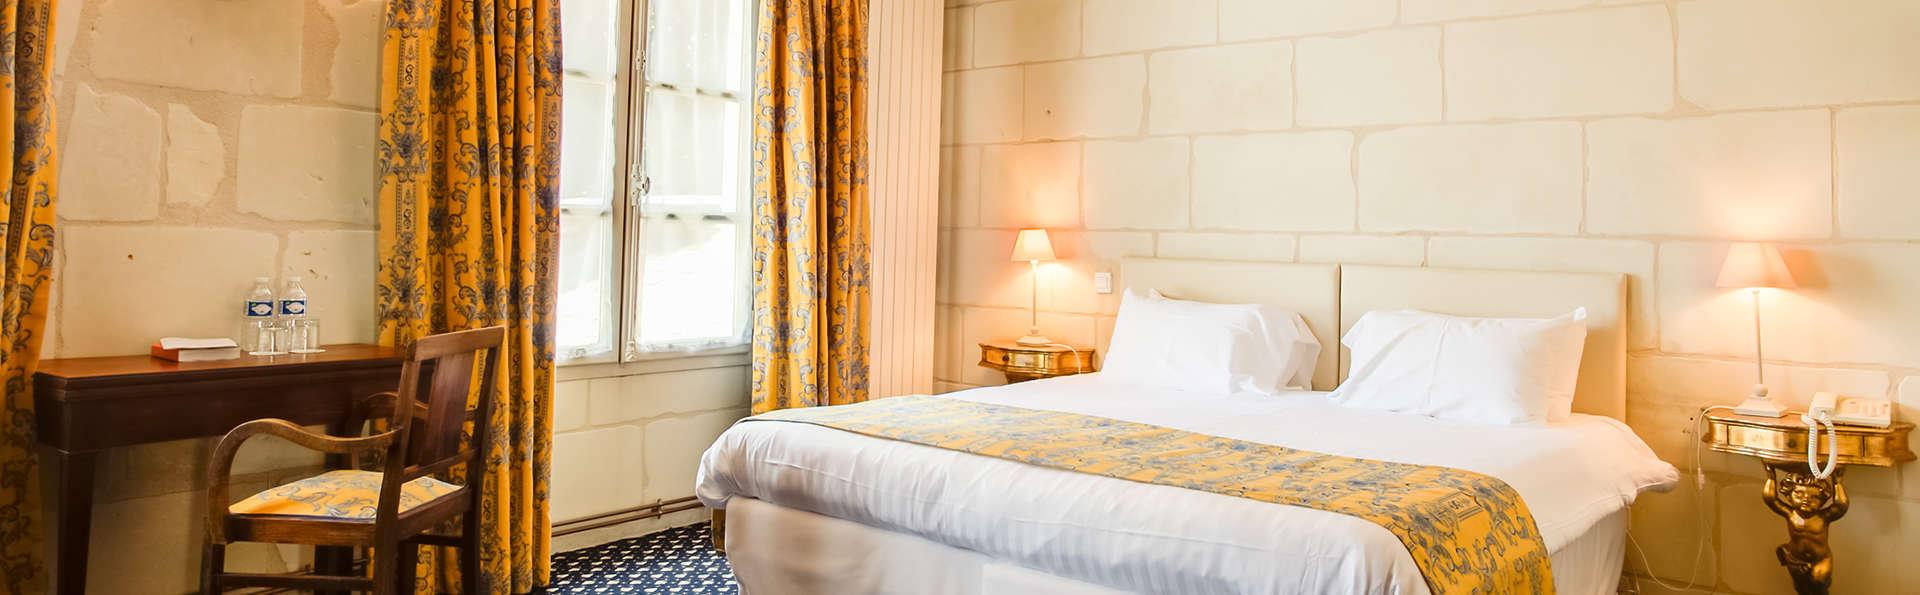 Le grand monarque centre 3 azay le rideau france - Hotel le grand monarque azay le rideau ...